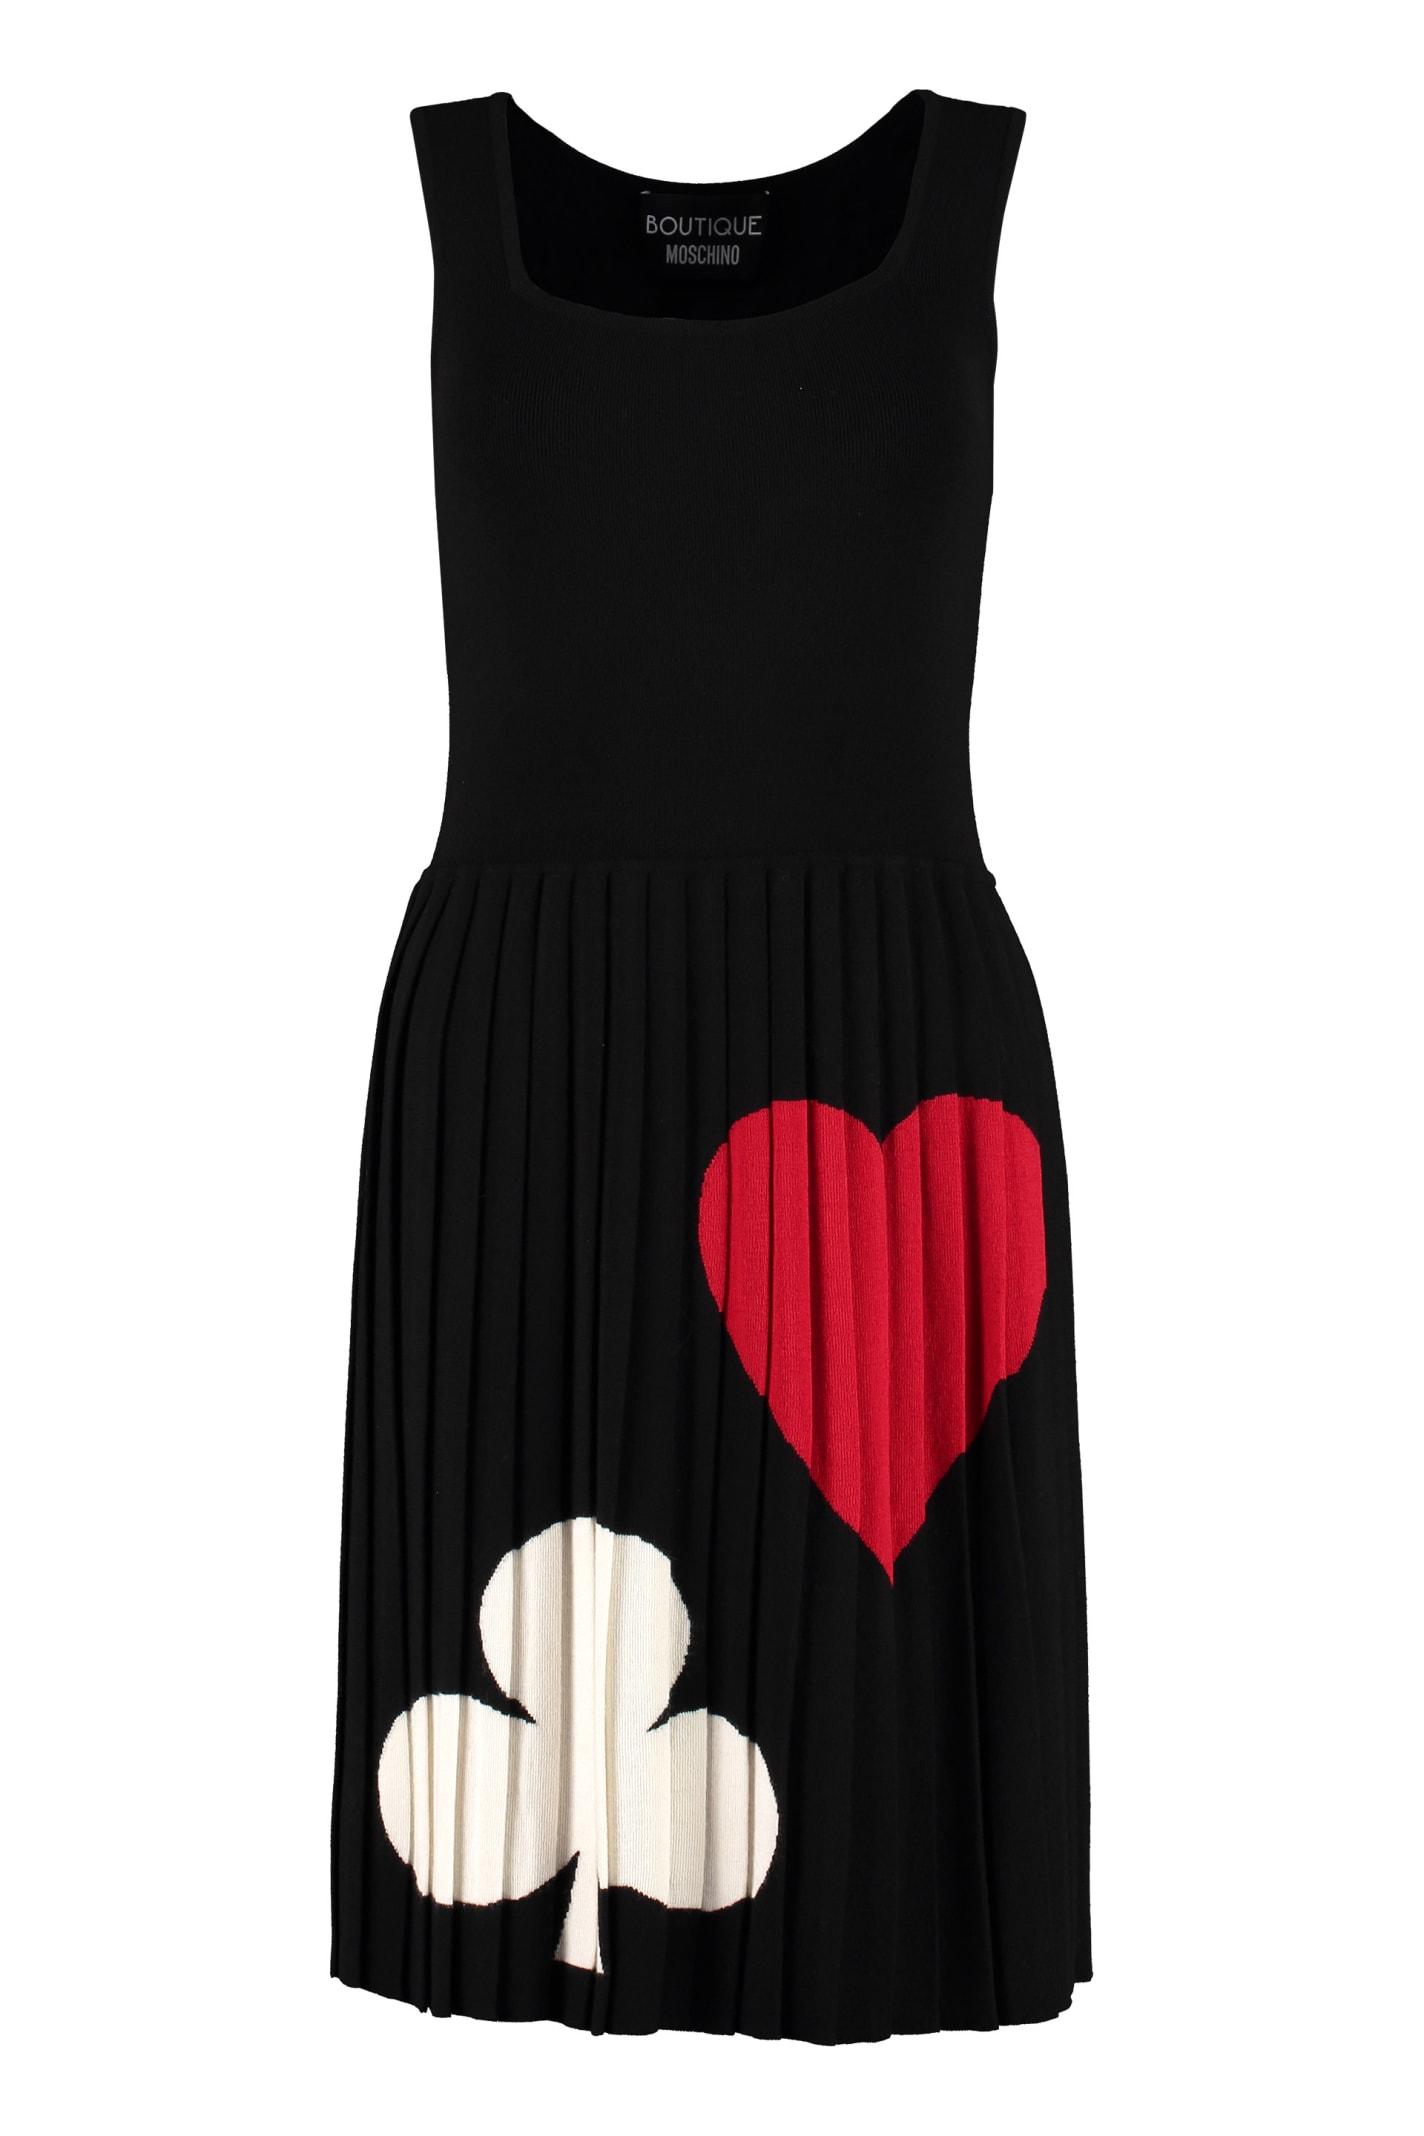 Boutique Moschino Intarsia Knit-dress